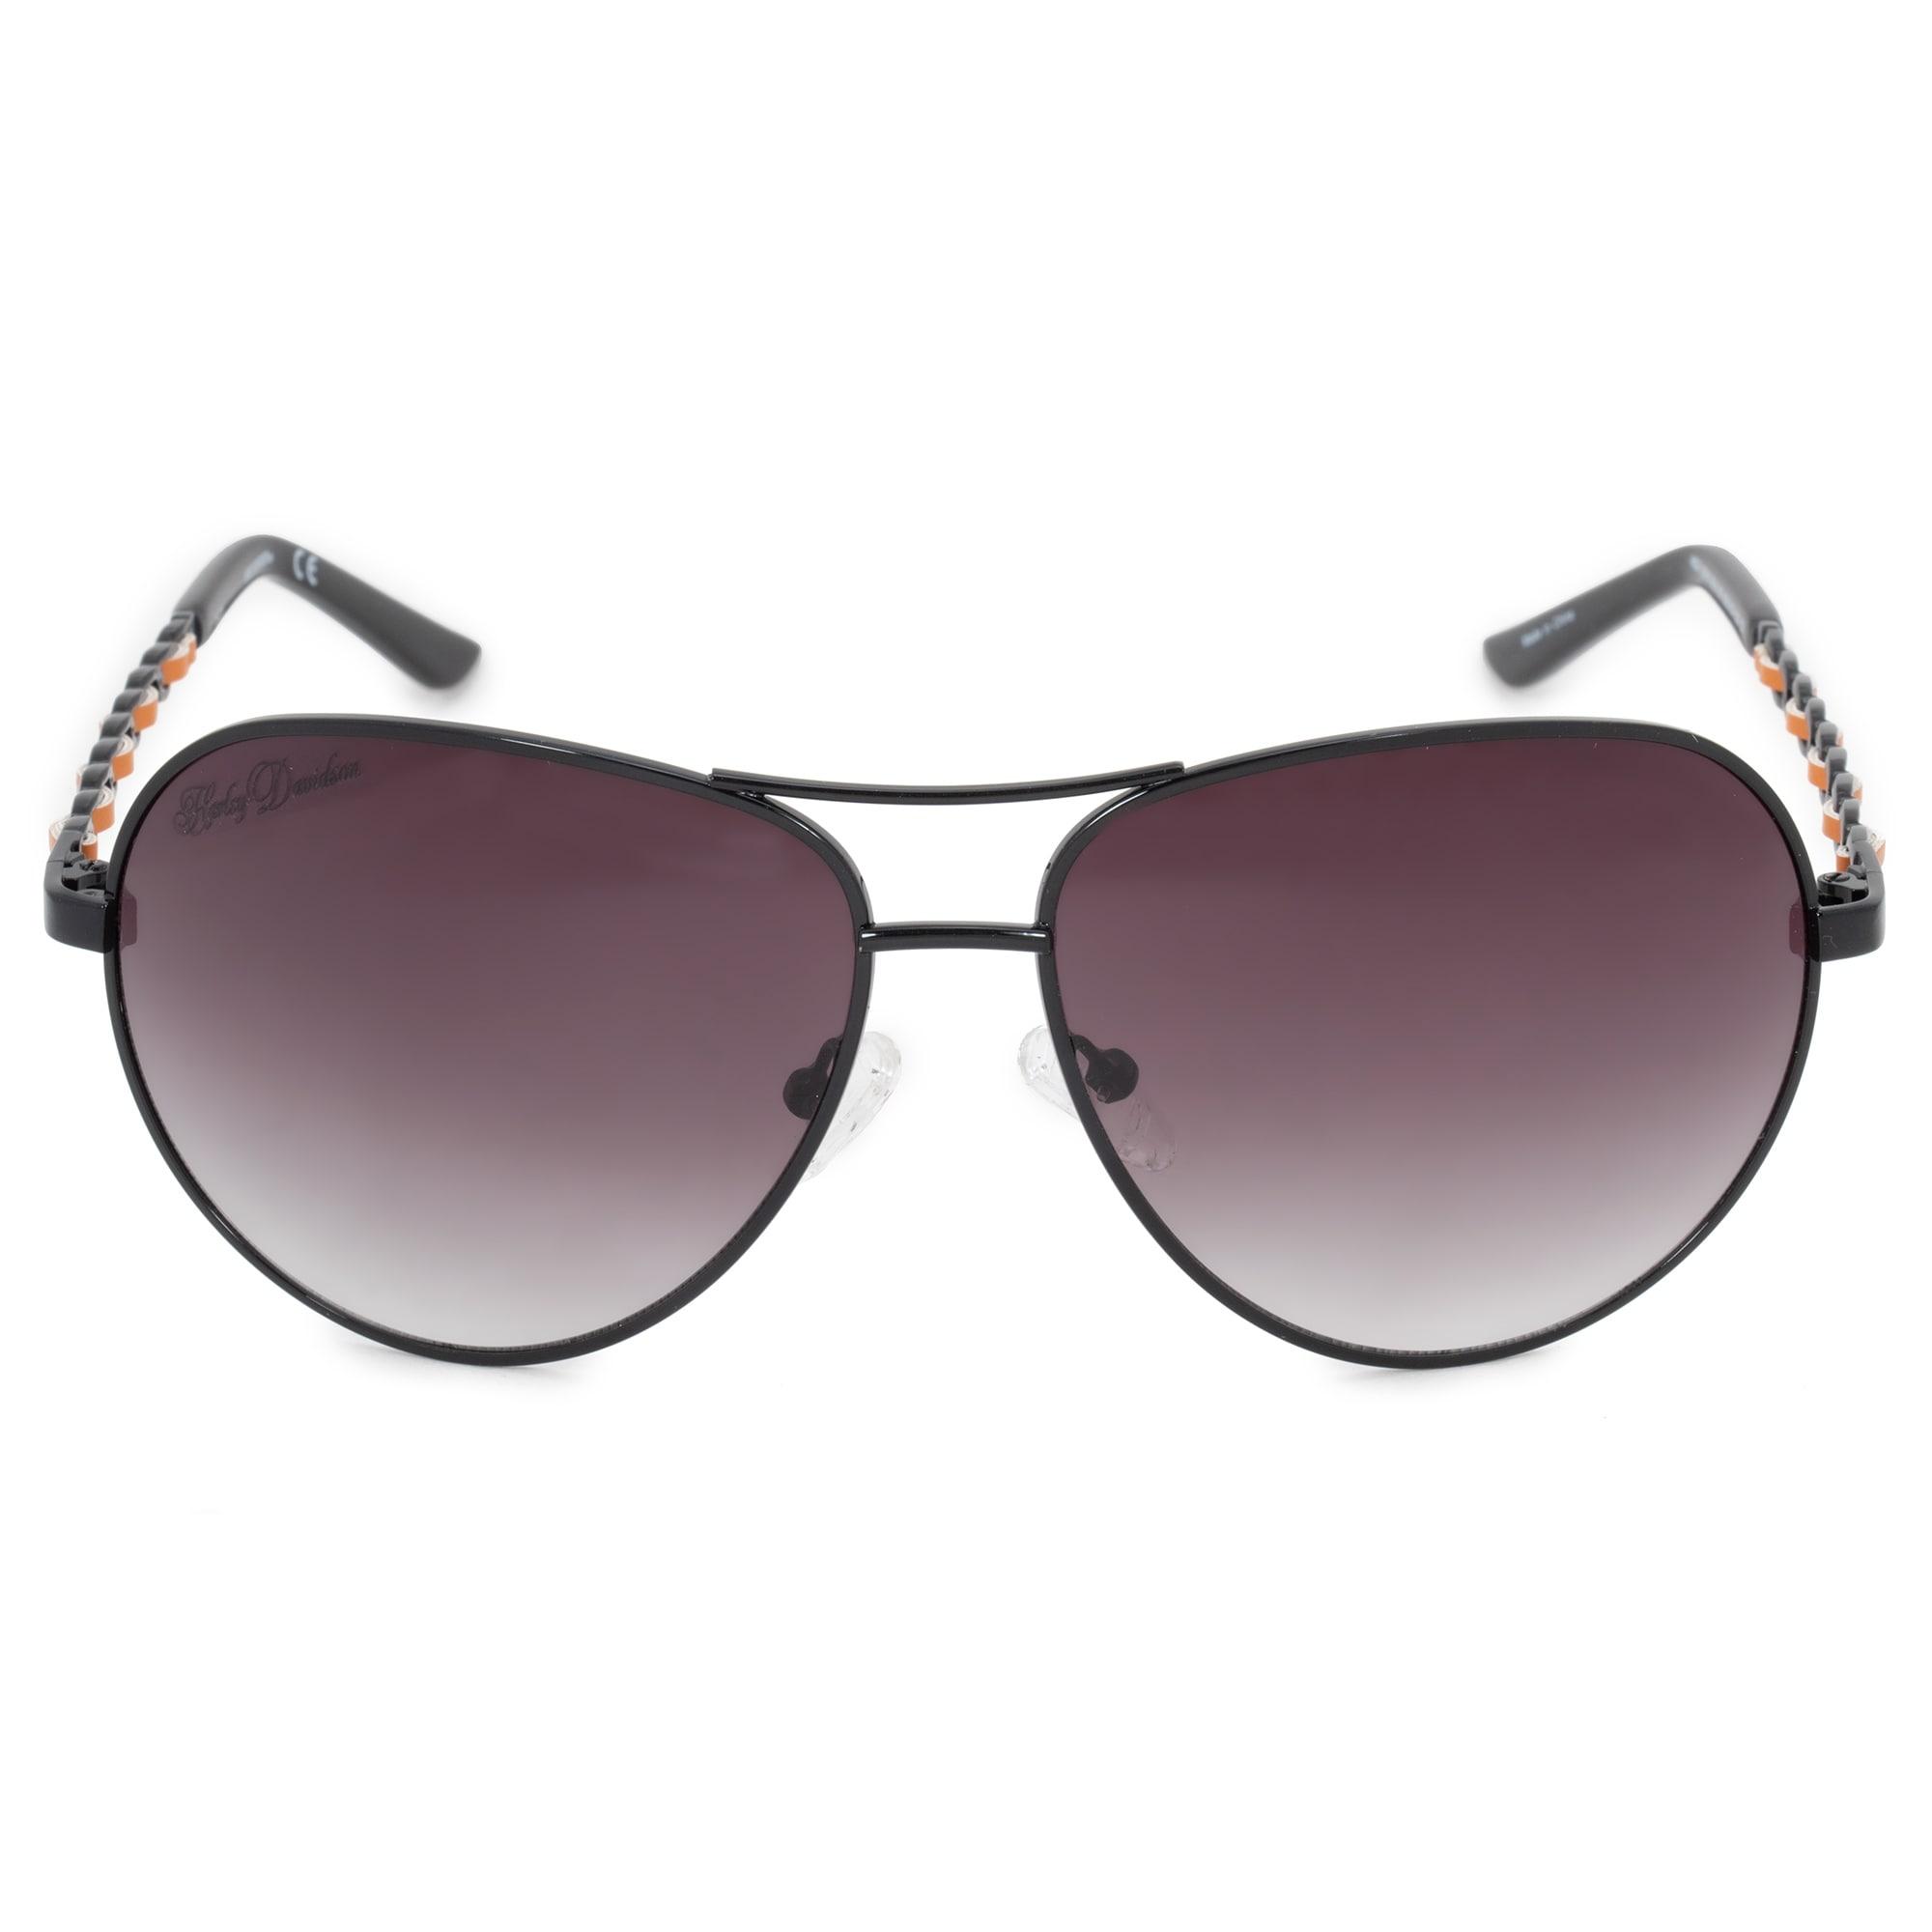 39435bec87 Shop Harley Davidson Aviator Sunglasses HDS5016 BLK 35 62 - Free ...